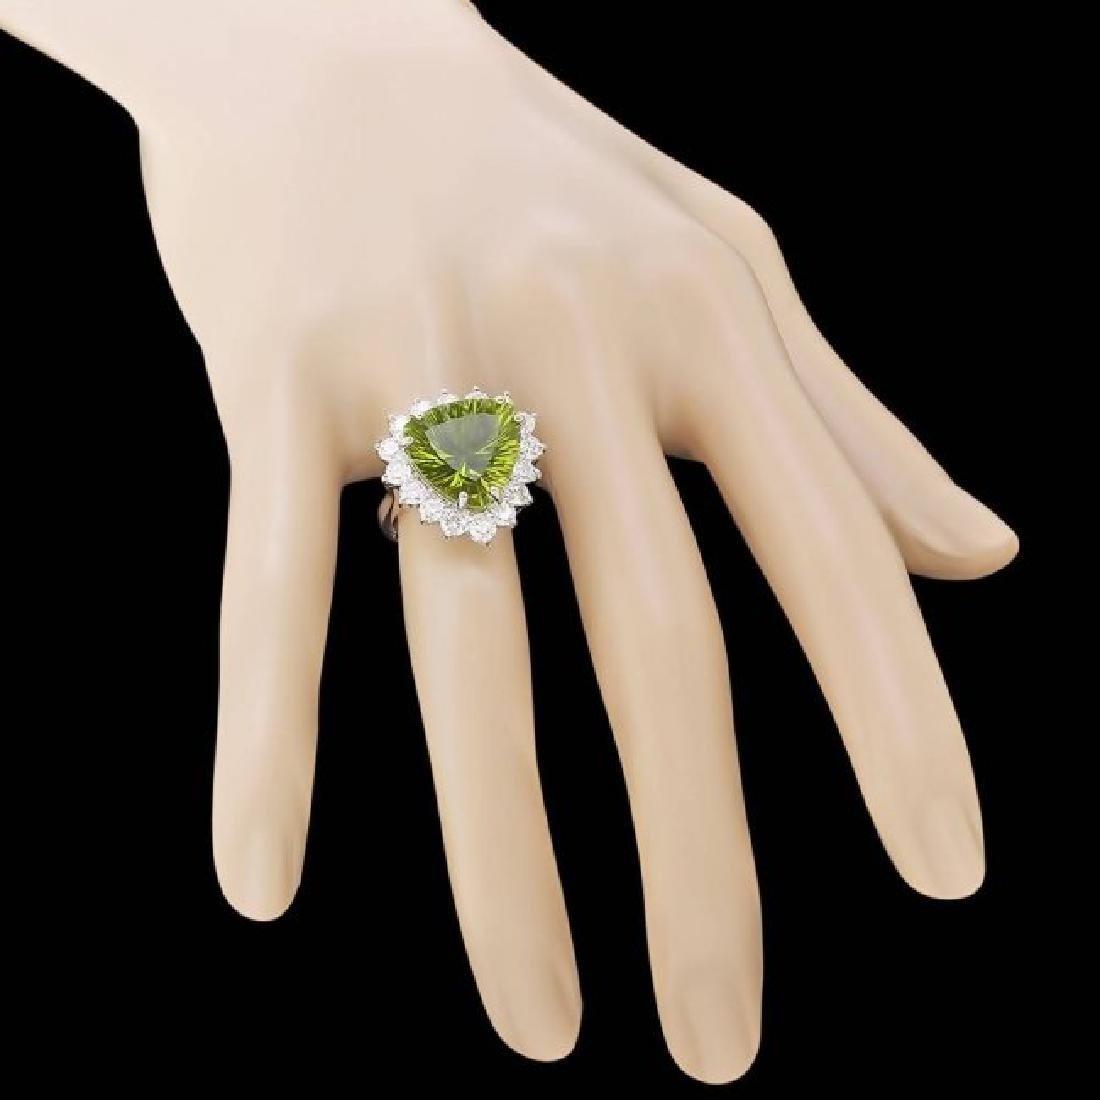 14k White Gold 9.50ct Peridot 1.80ct Diamond Ring - 4